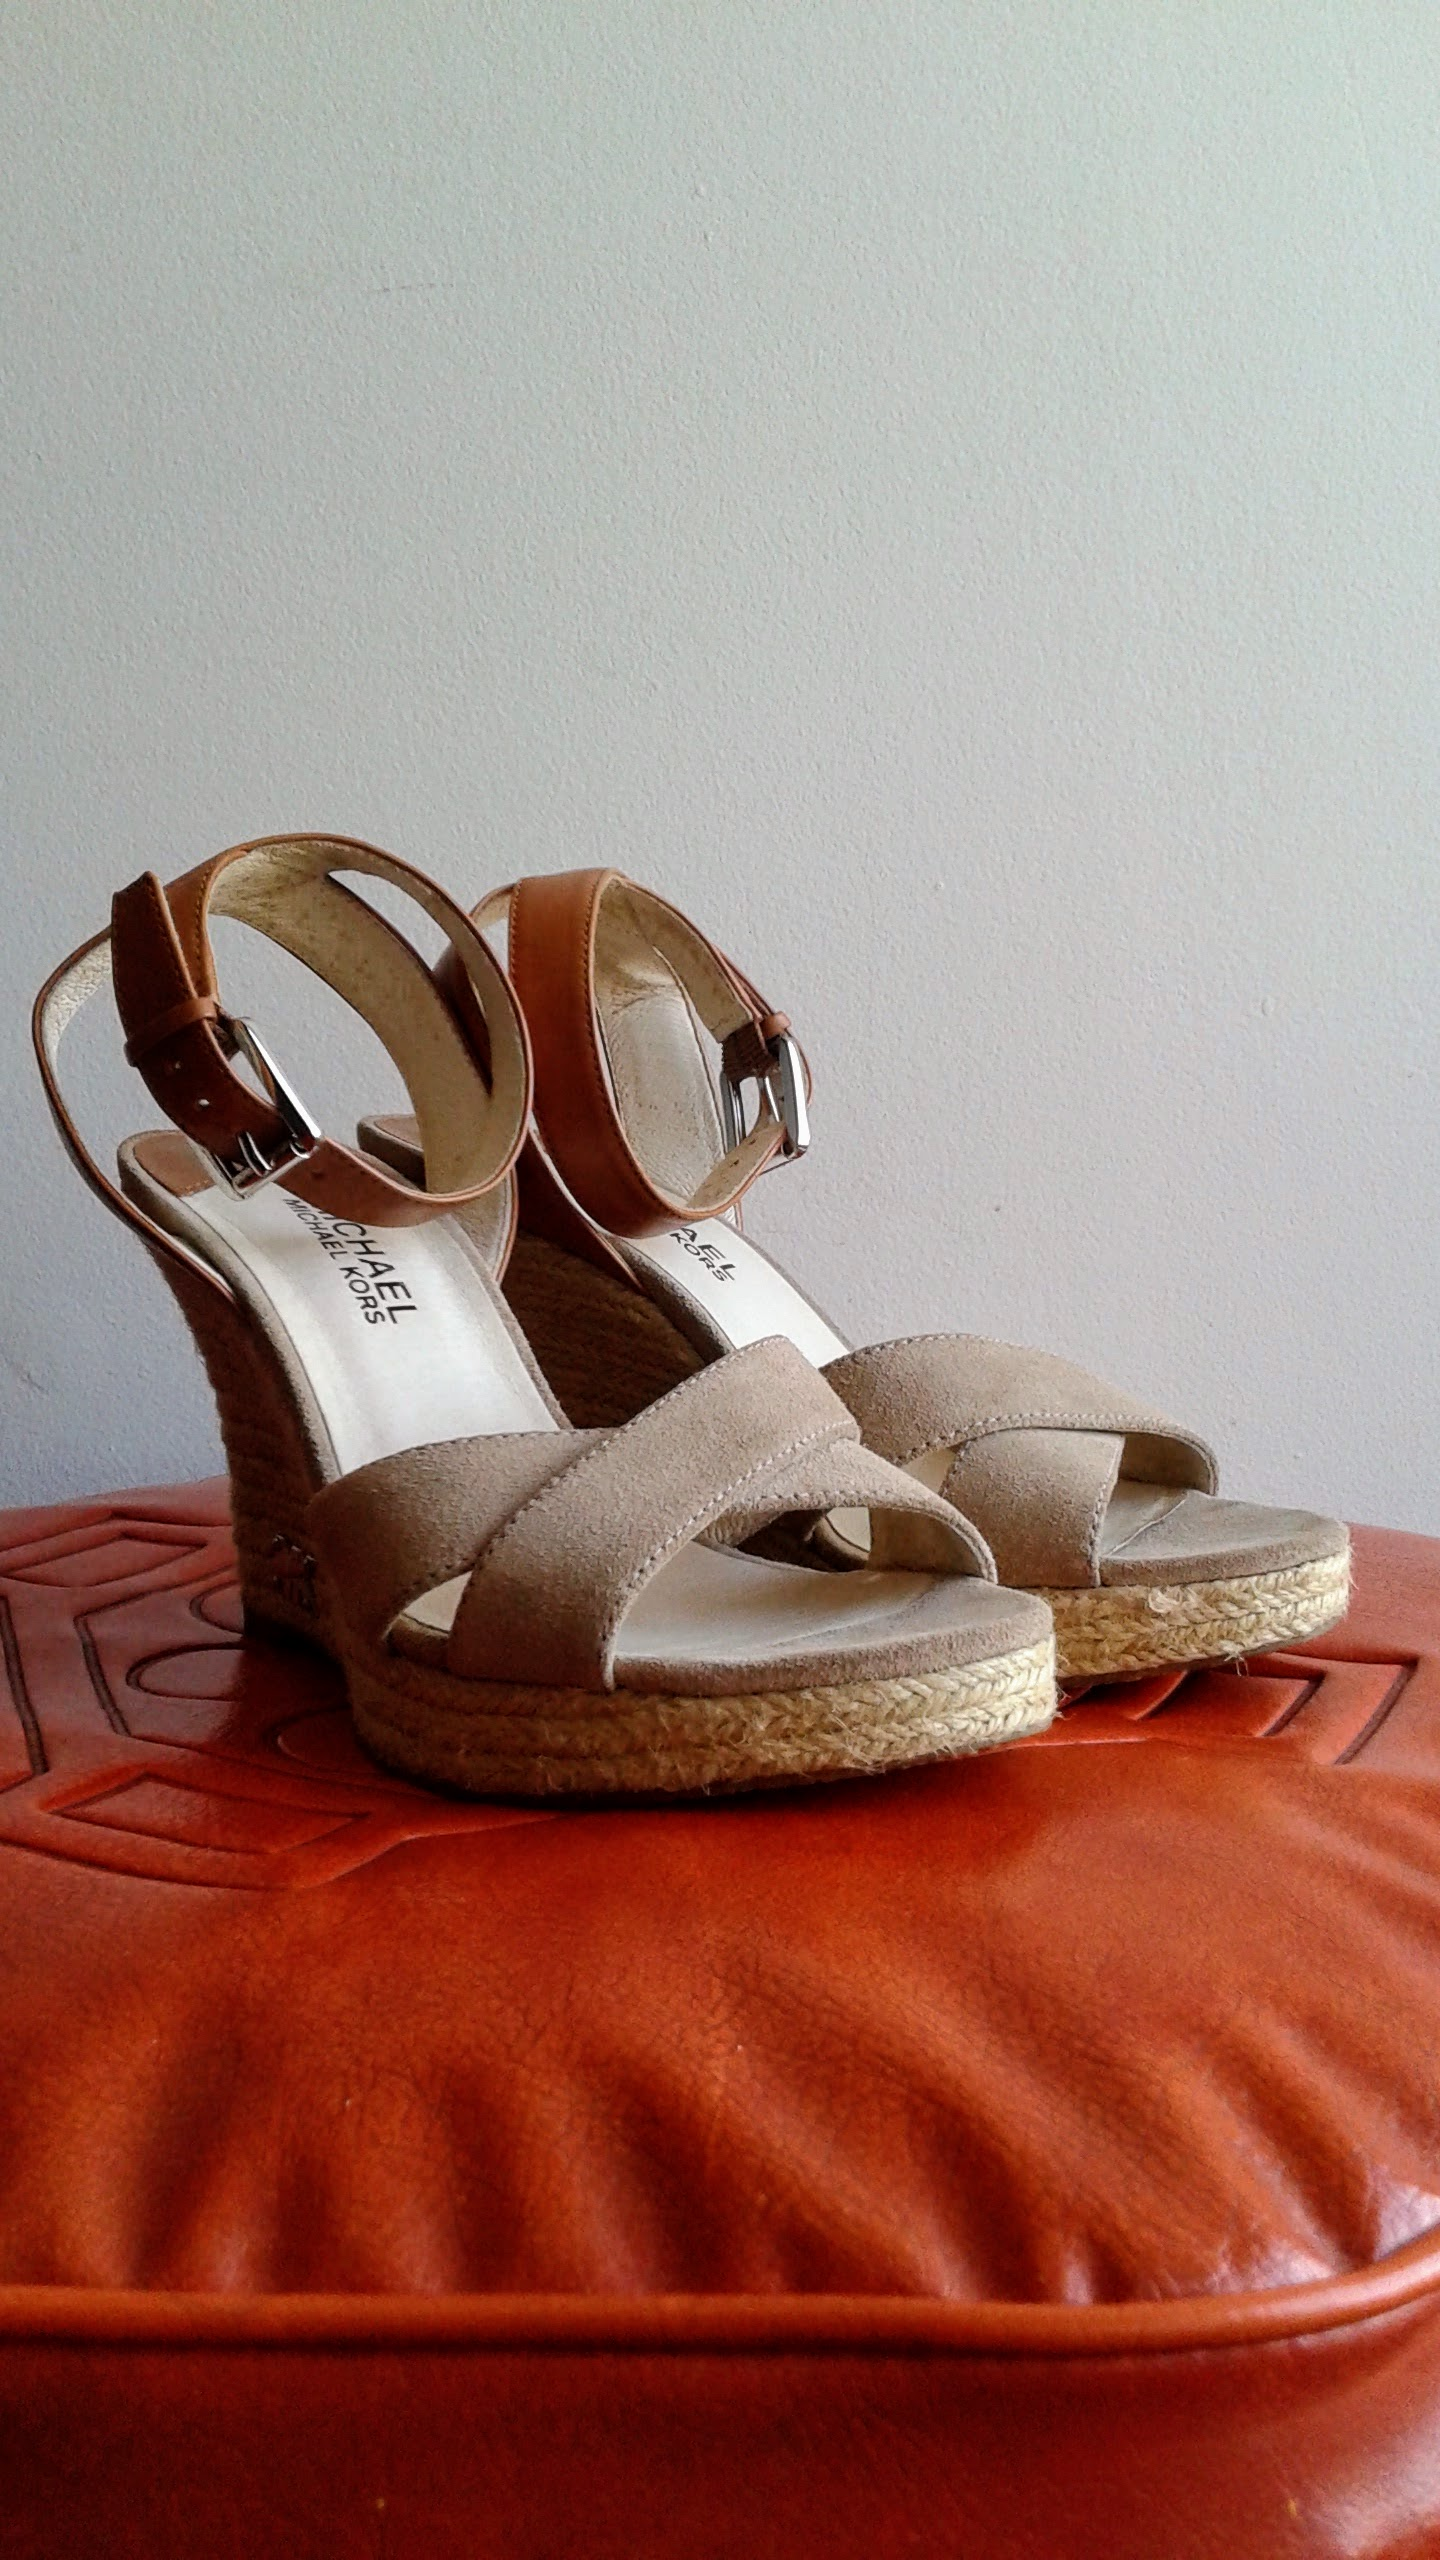 Michael Kors  sandals; S7, $32